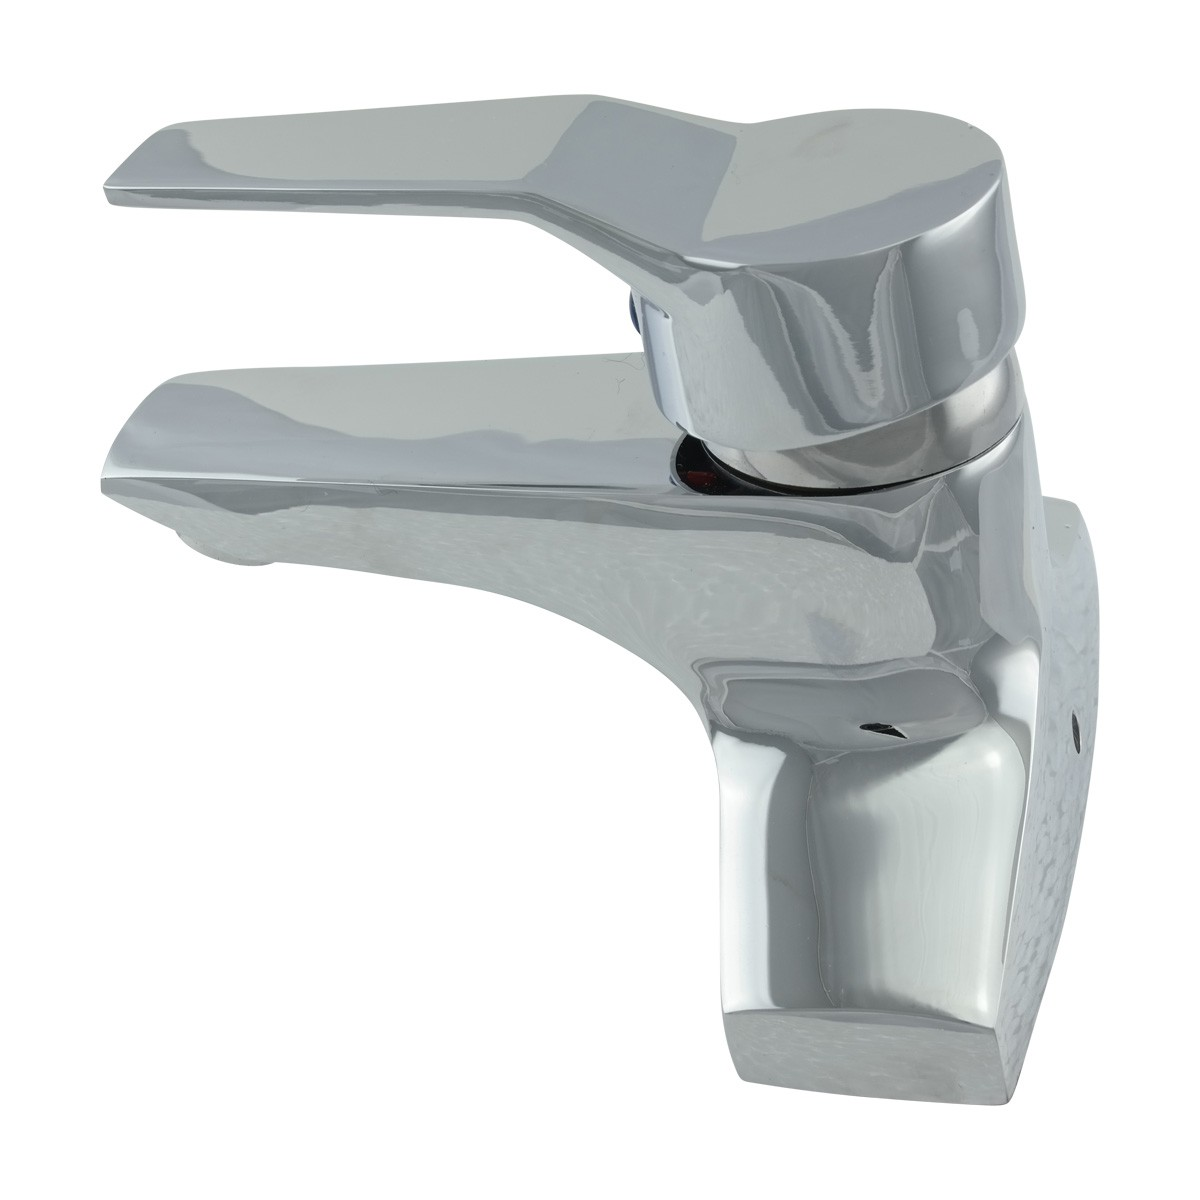 Bathroom Faucet Chrome Plated Centerset 4 316H 1 Handle 4 inch Chrome Bathroom Faucet Brass Bathroom Faucets Bathroom Faucet Single Handle